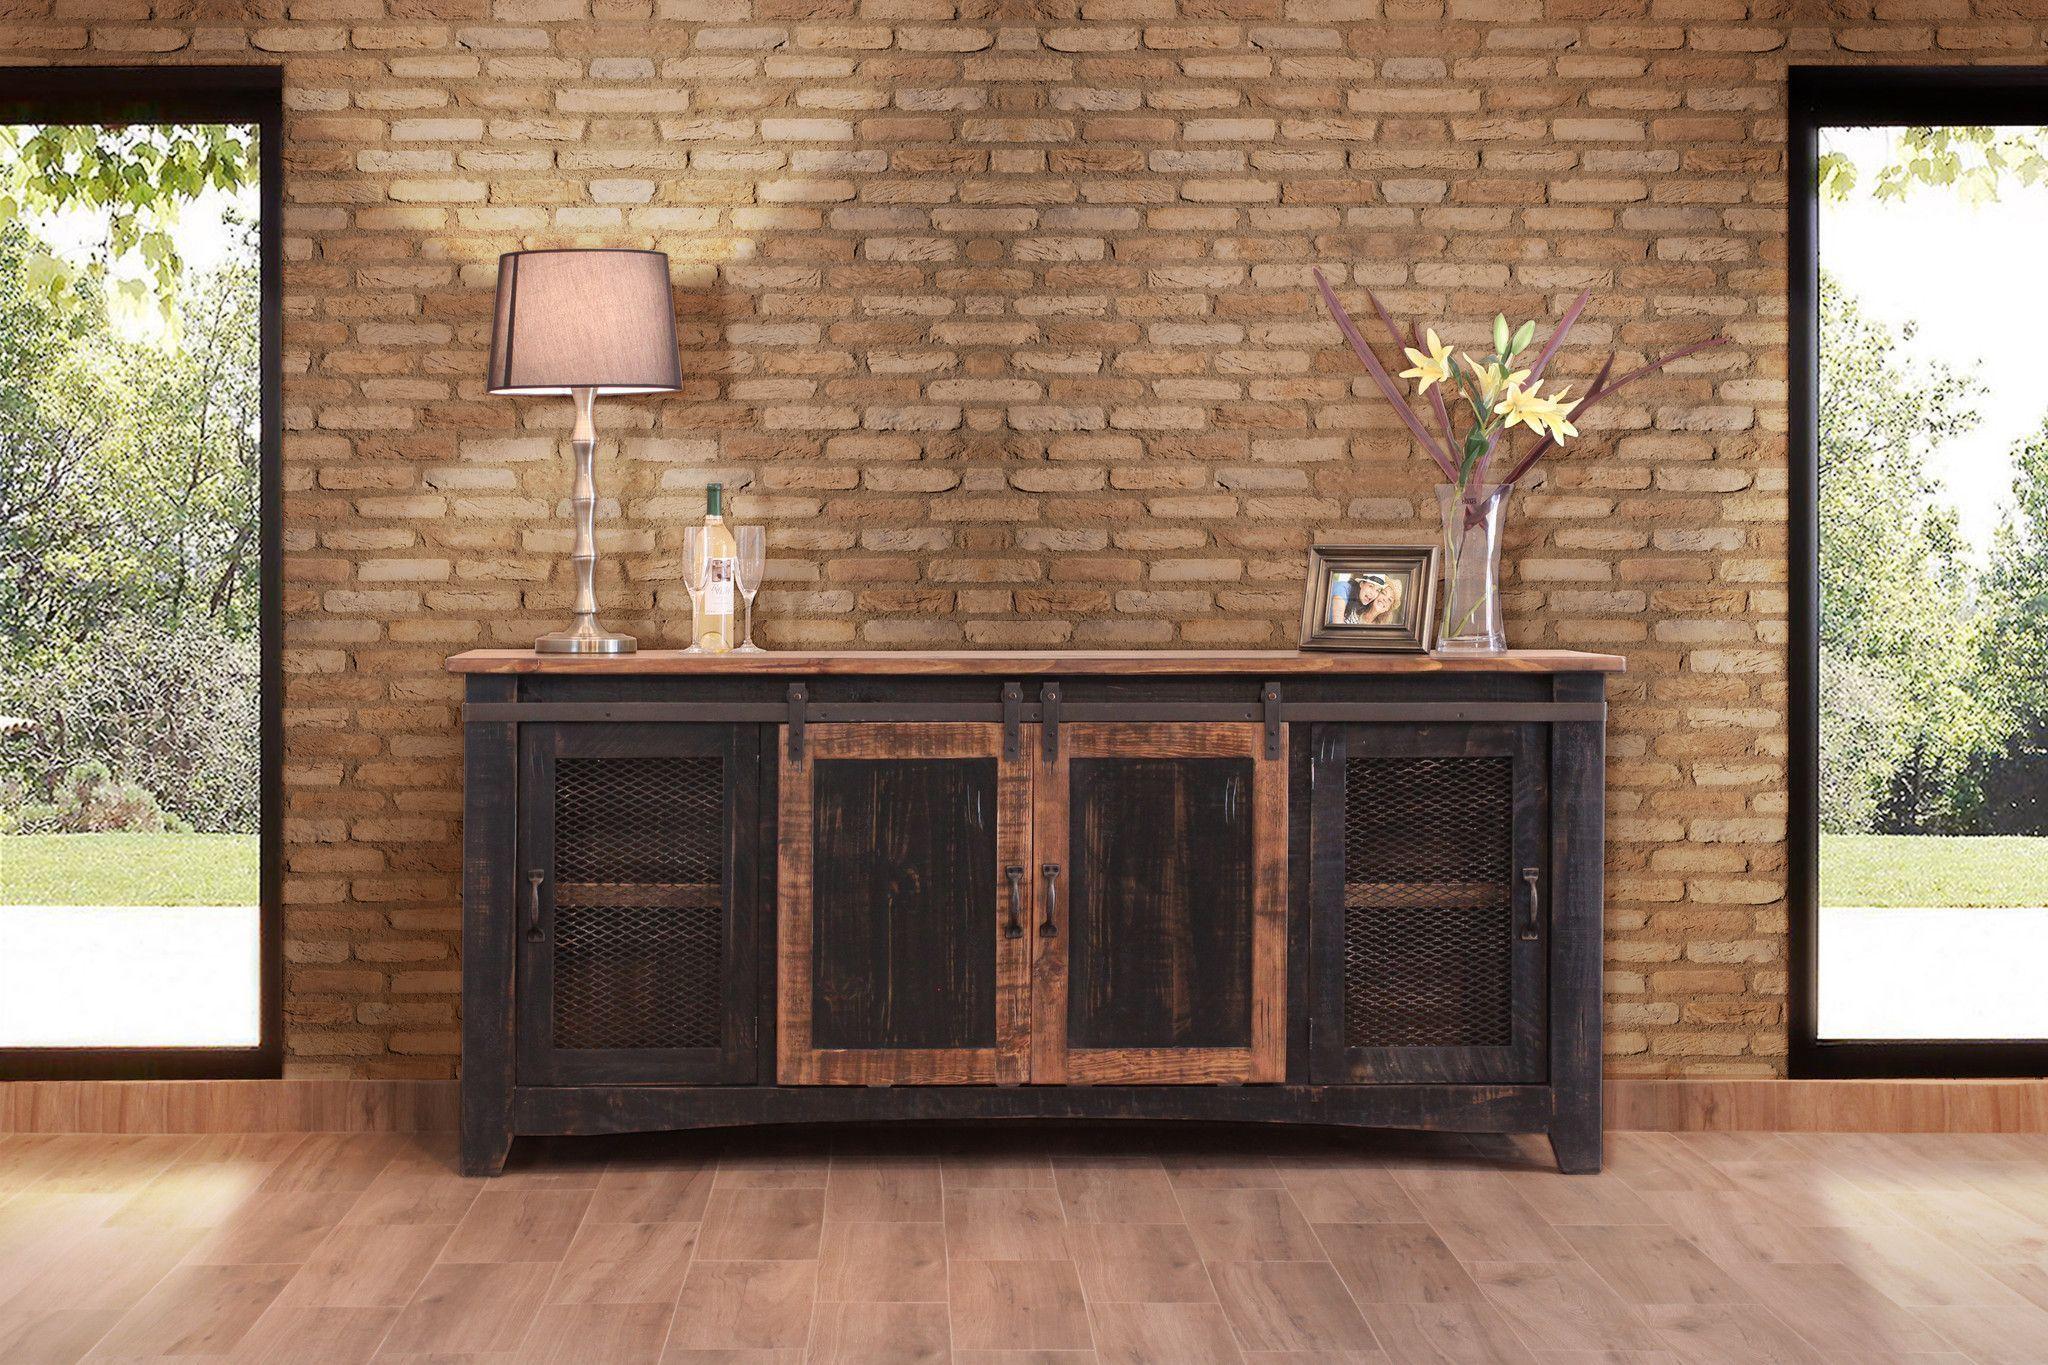 Greenview Sliding Door Distressed Black Tv Stand 80 Inch Tv Stand Wood Solid Wood Tv Stand Black Tv Stand